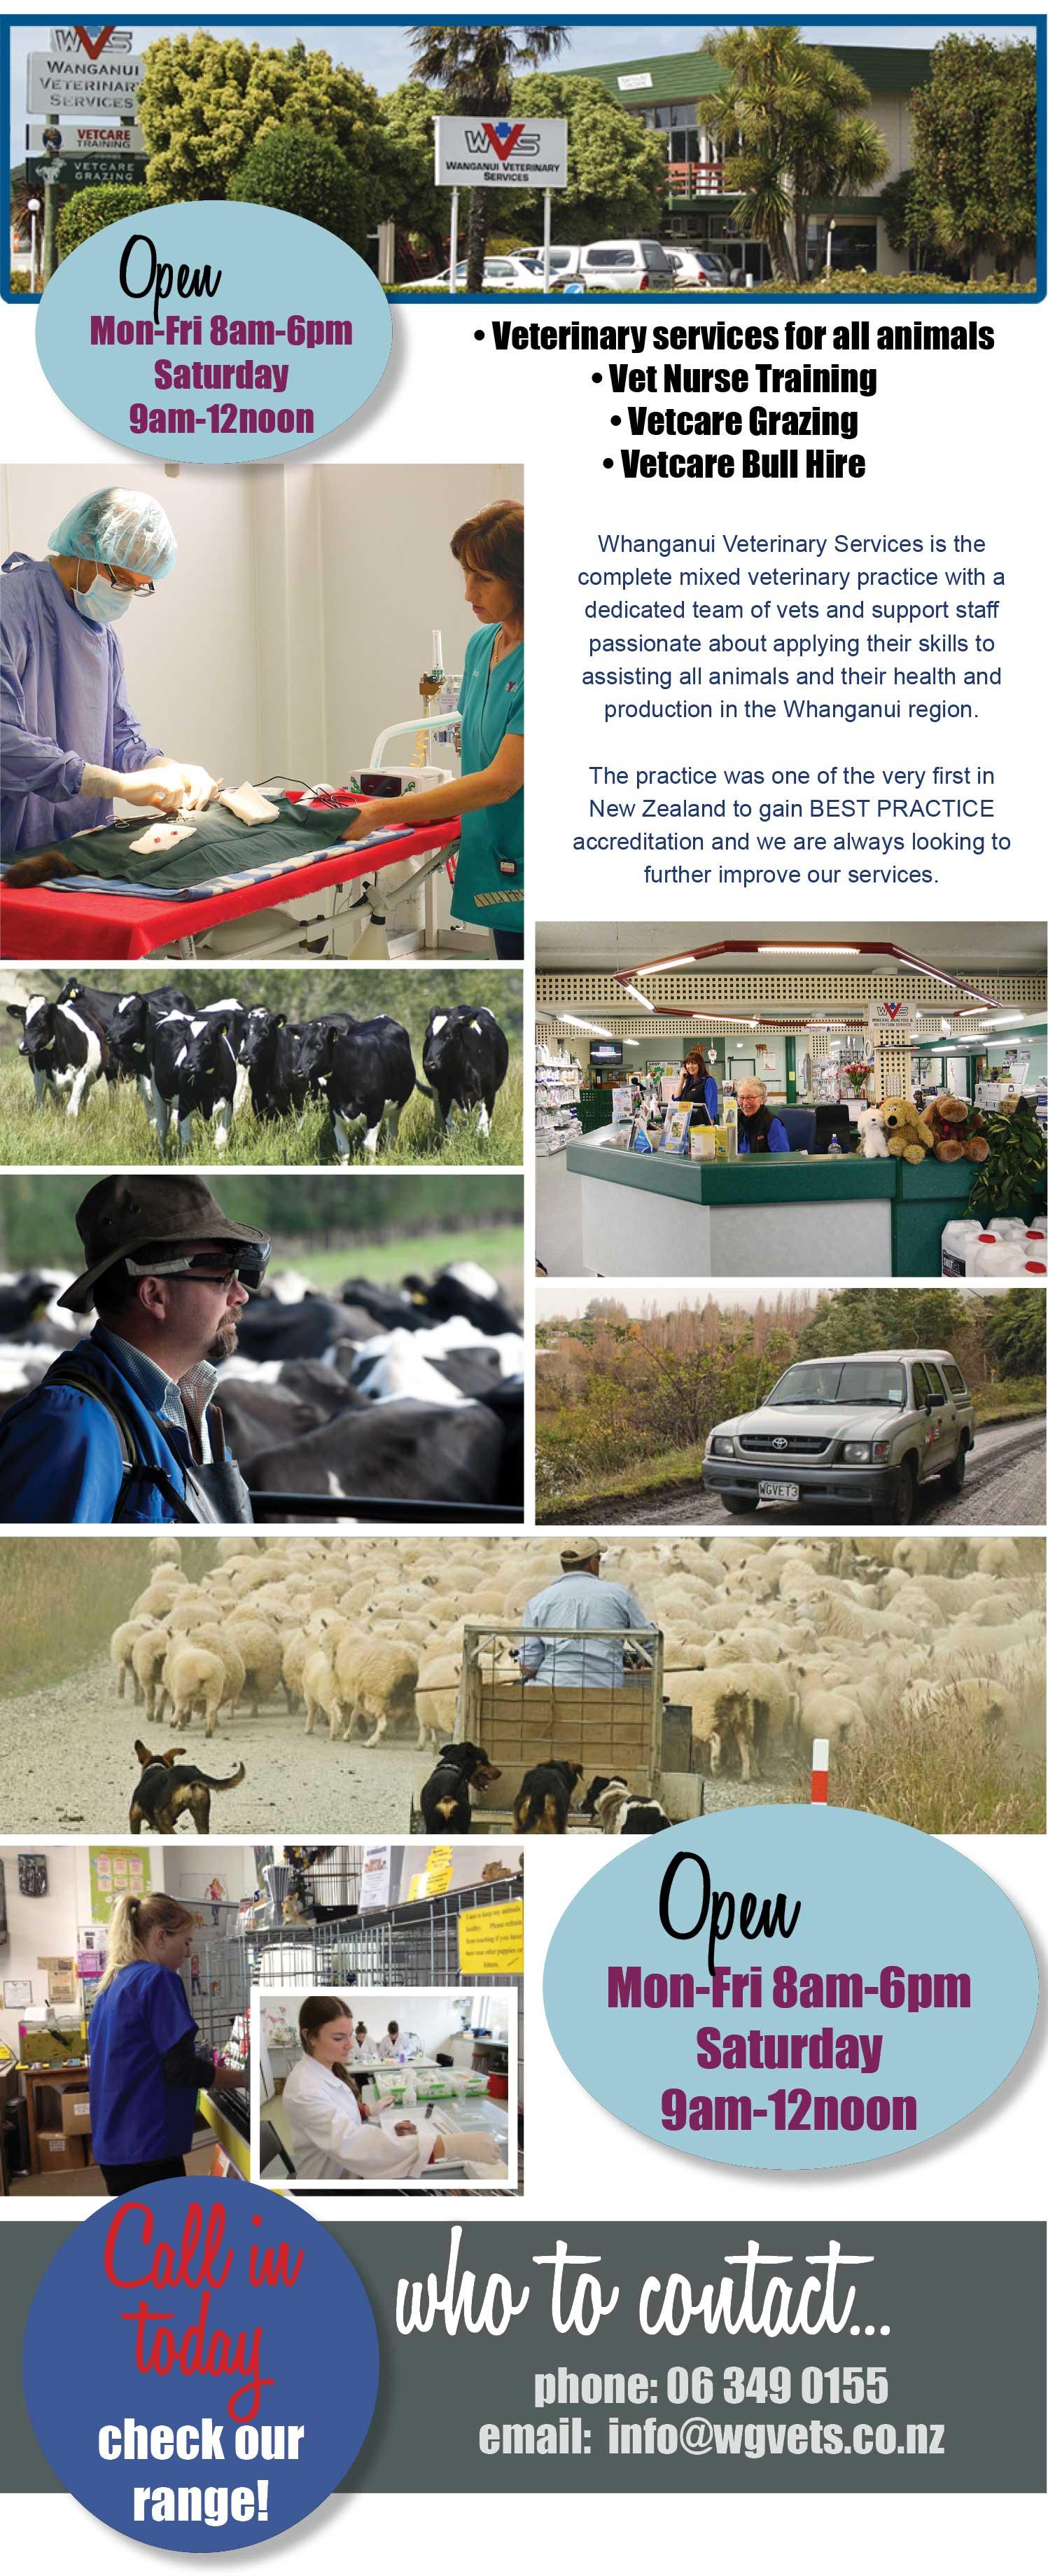 Wanganui Vet Services. Veterinary services for all animals, Vet nurse training, Vetcare grazing, Vetcare Bull hire, vets Wanganui